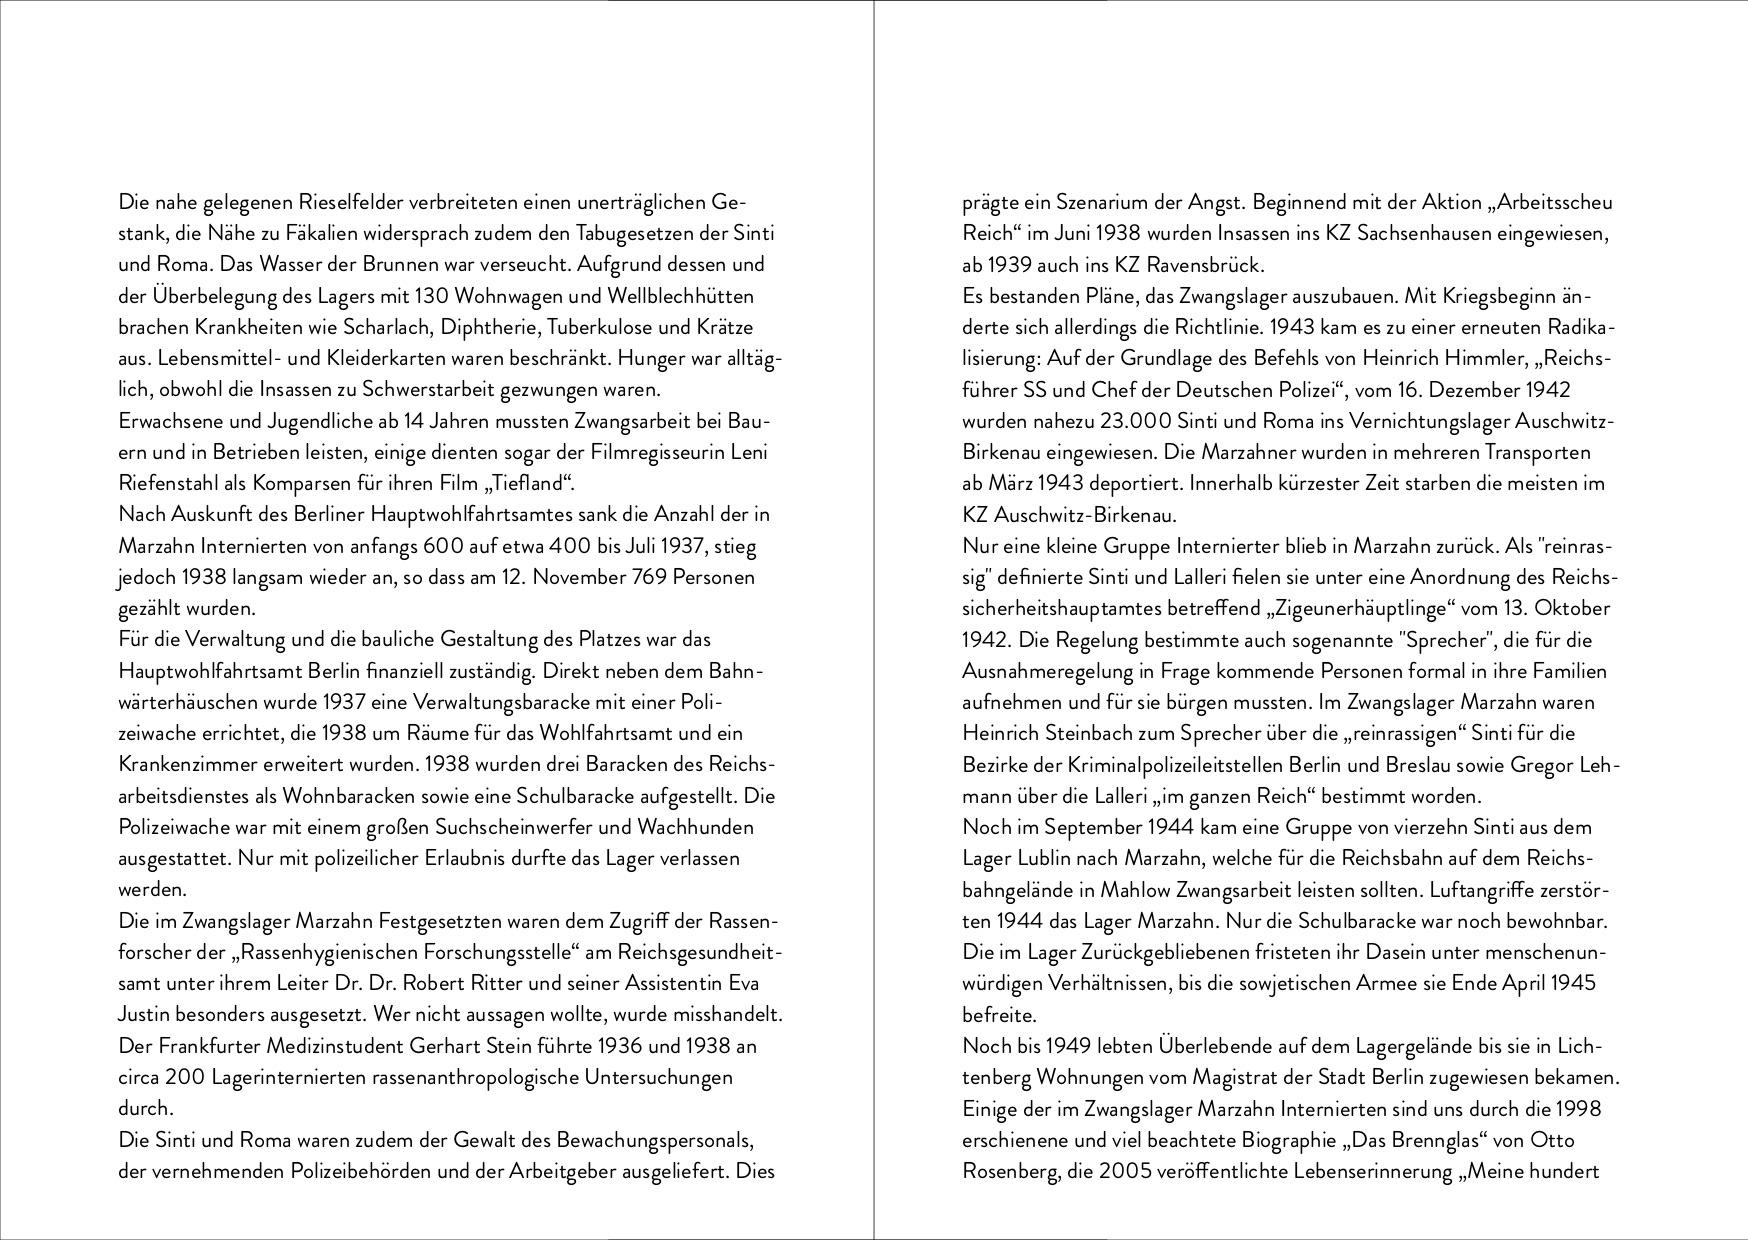 Doku-Broschüre_spreeagenten_RAM_Bro_28-Seiter_A5_03_15.12.17_S24+25.jpg